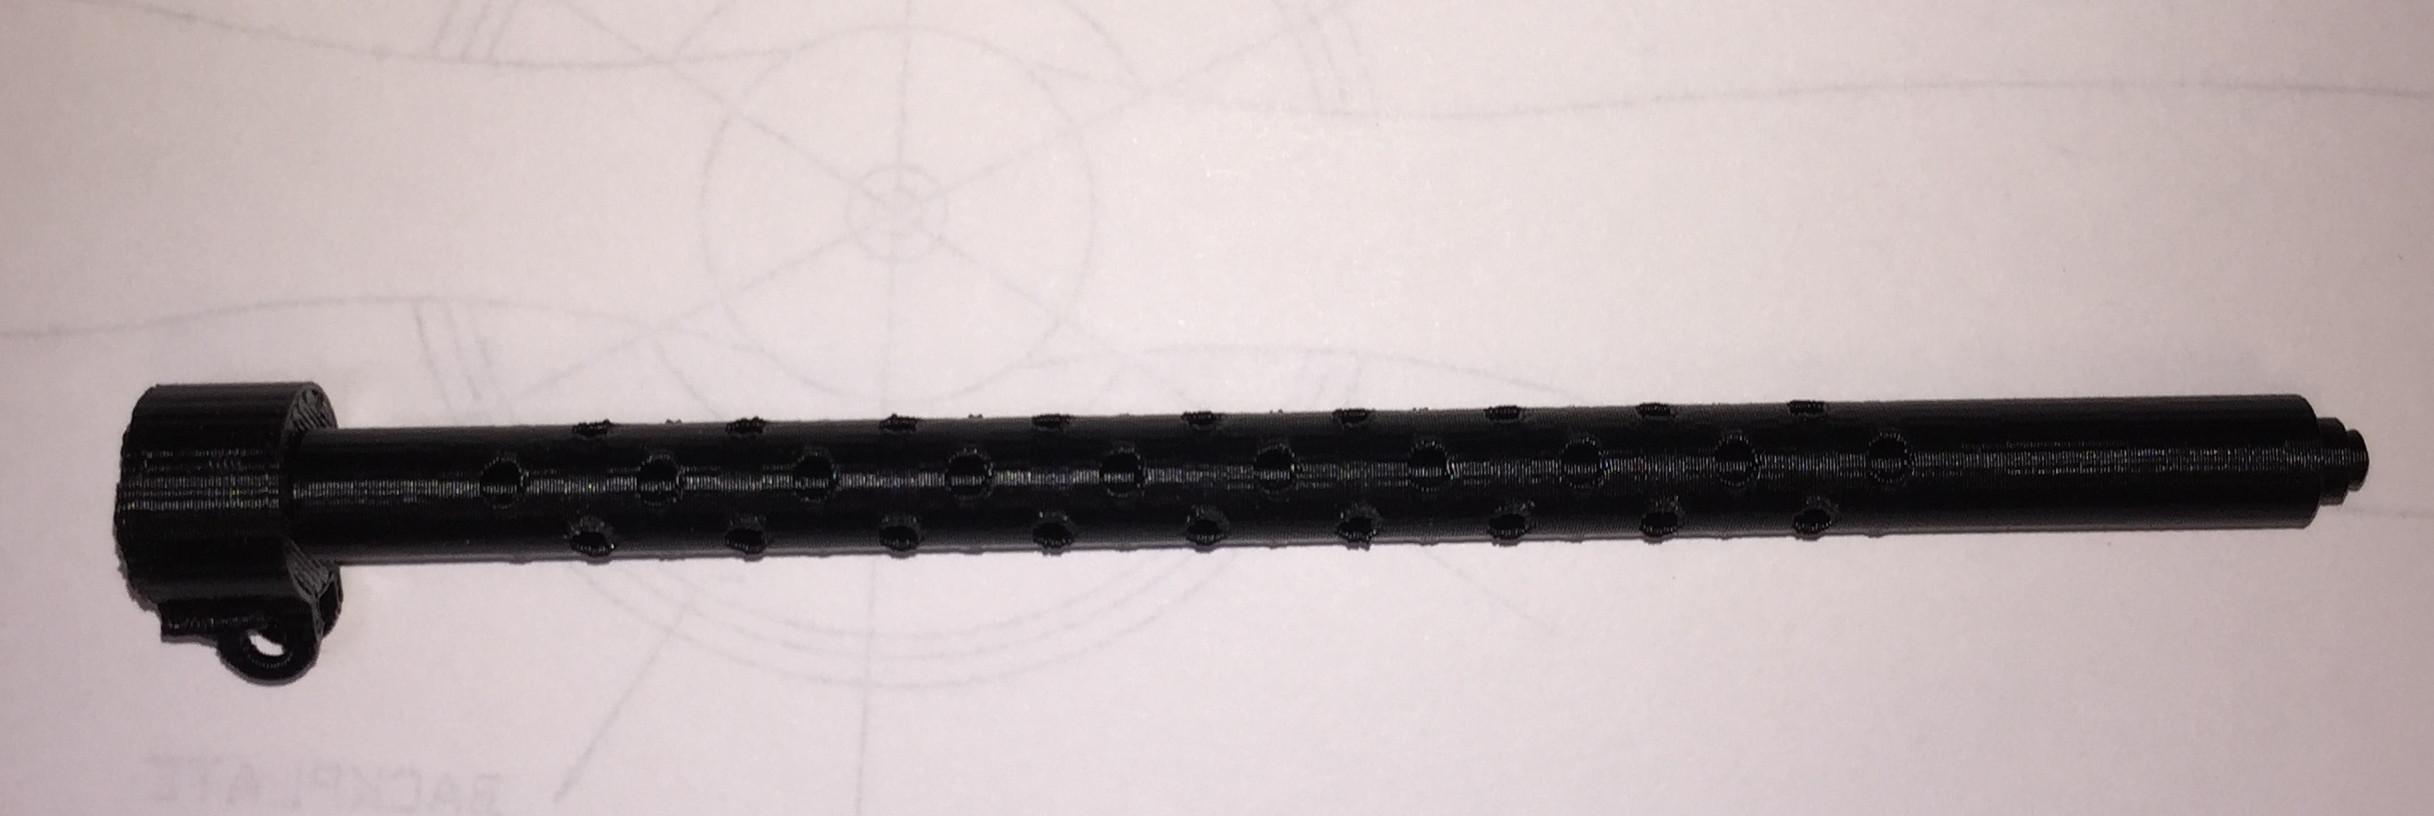 Browning 50 caliber MG barrel(AN/M2) - Scale Guns by Rosa